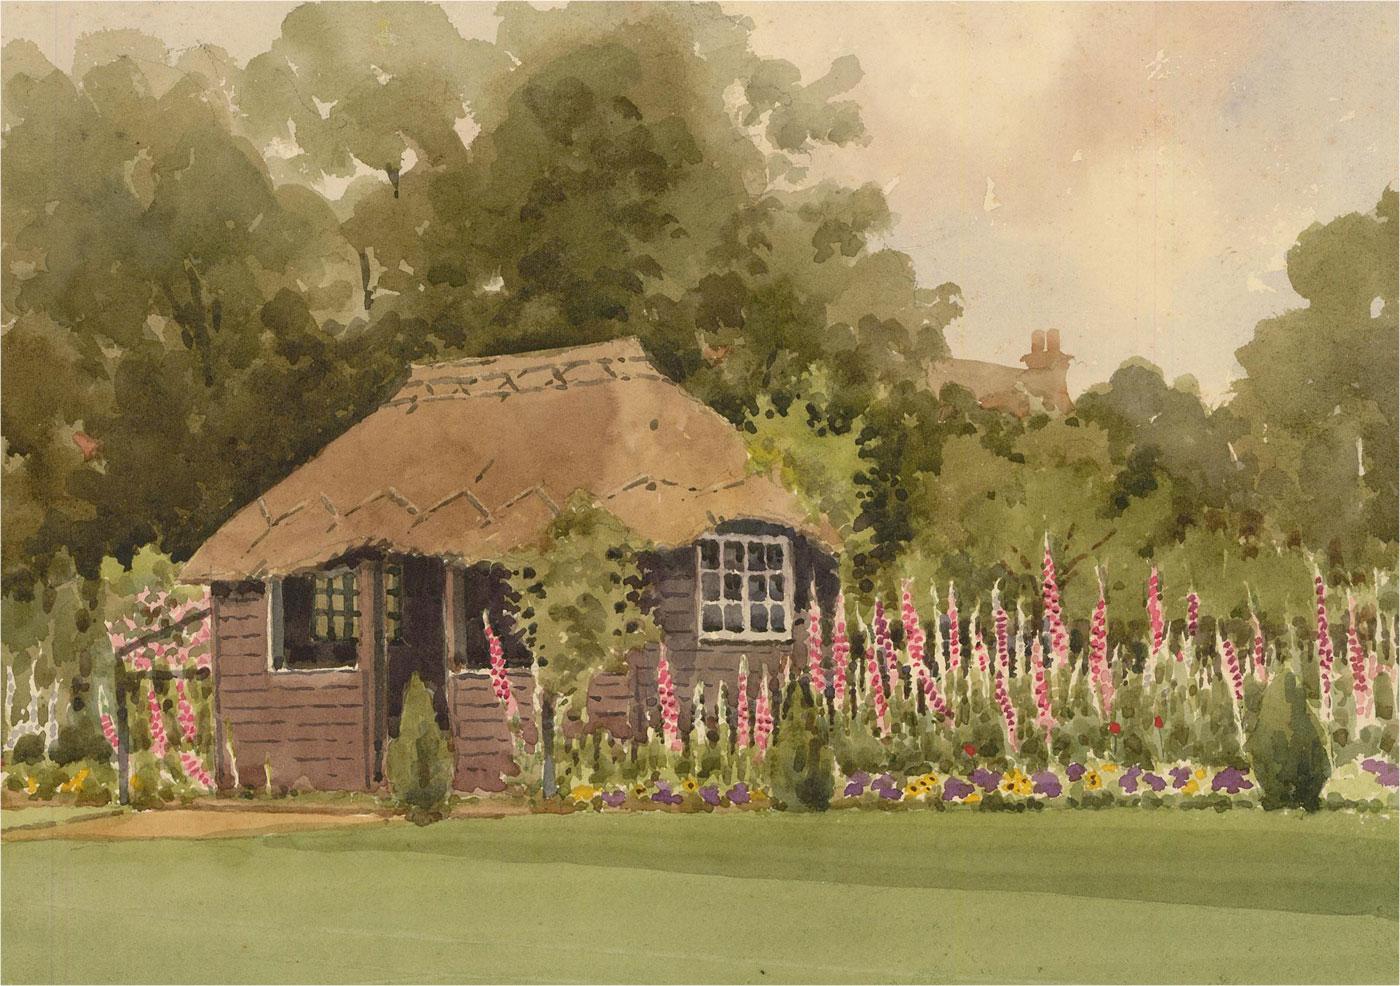 Raymond Turner Barker (1872-1945) - Early 20th Century Watercolour, Garden Scene